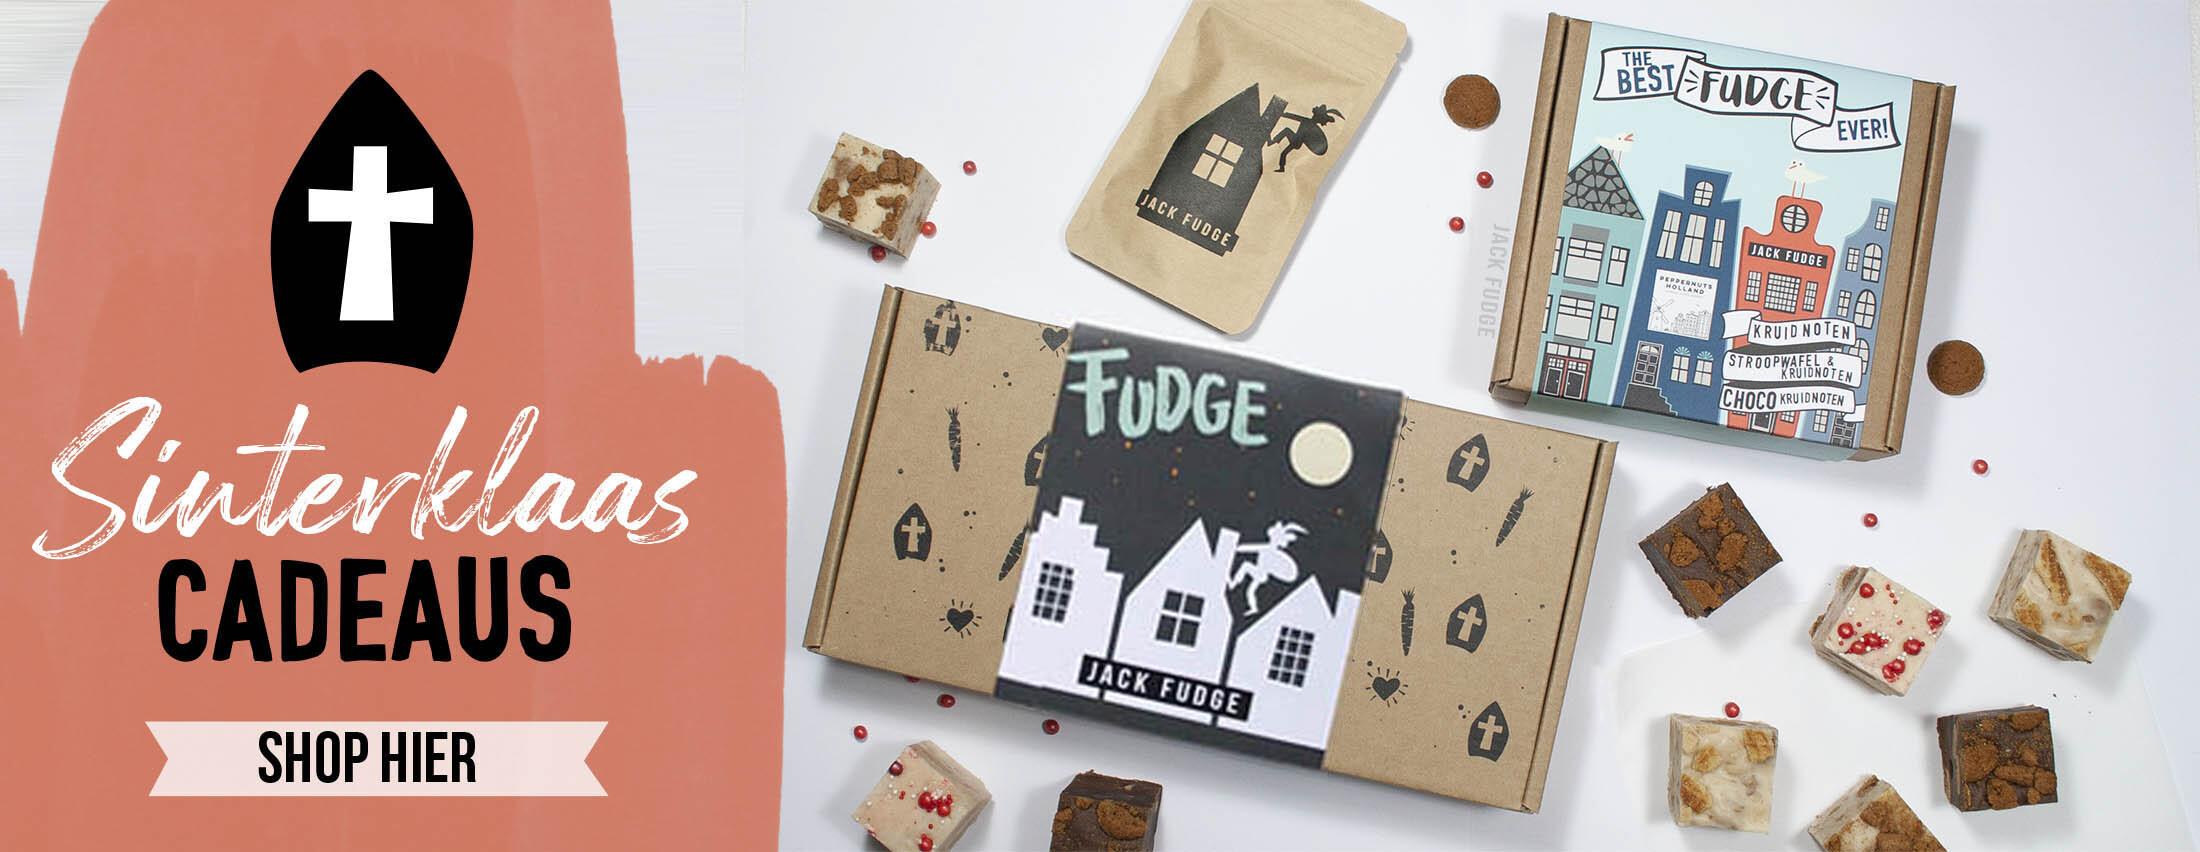 Sinterklaas fudge cadeaus